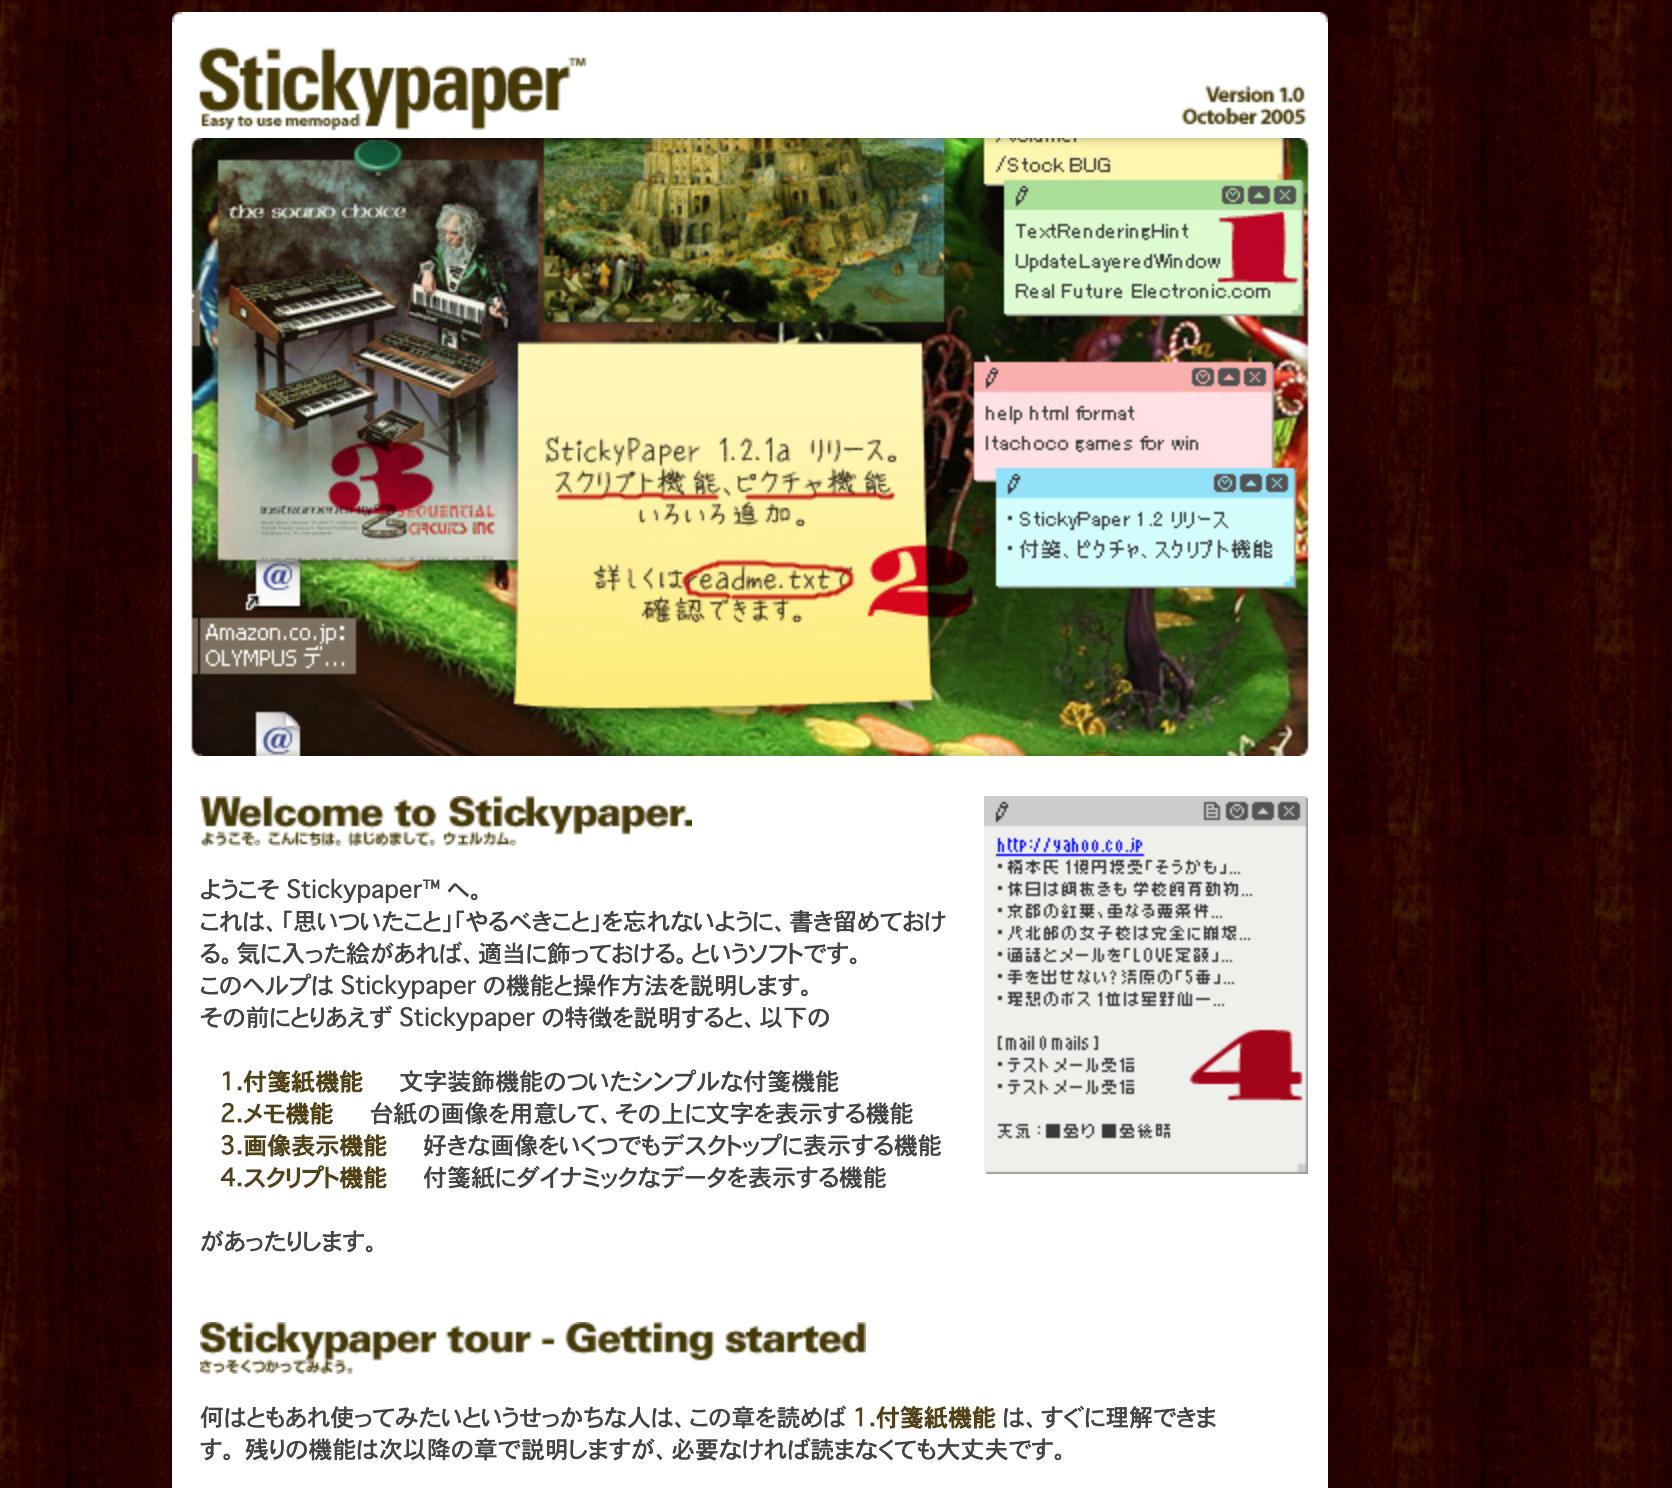 Stikypaper